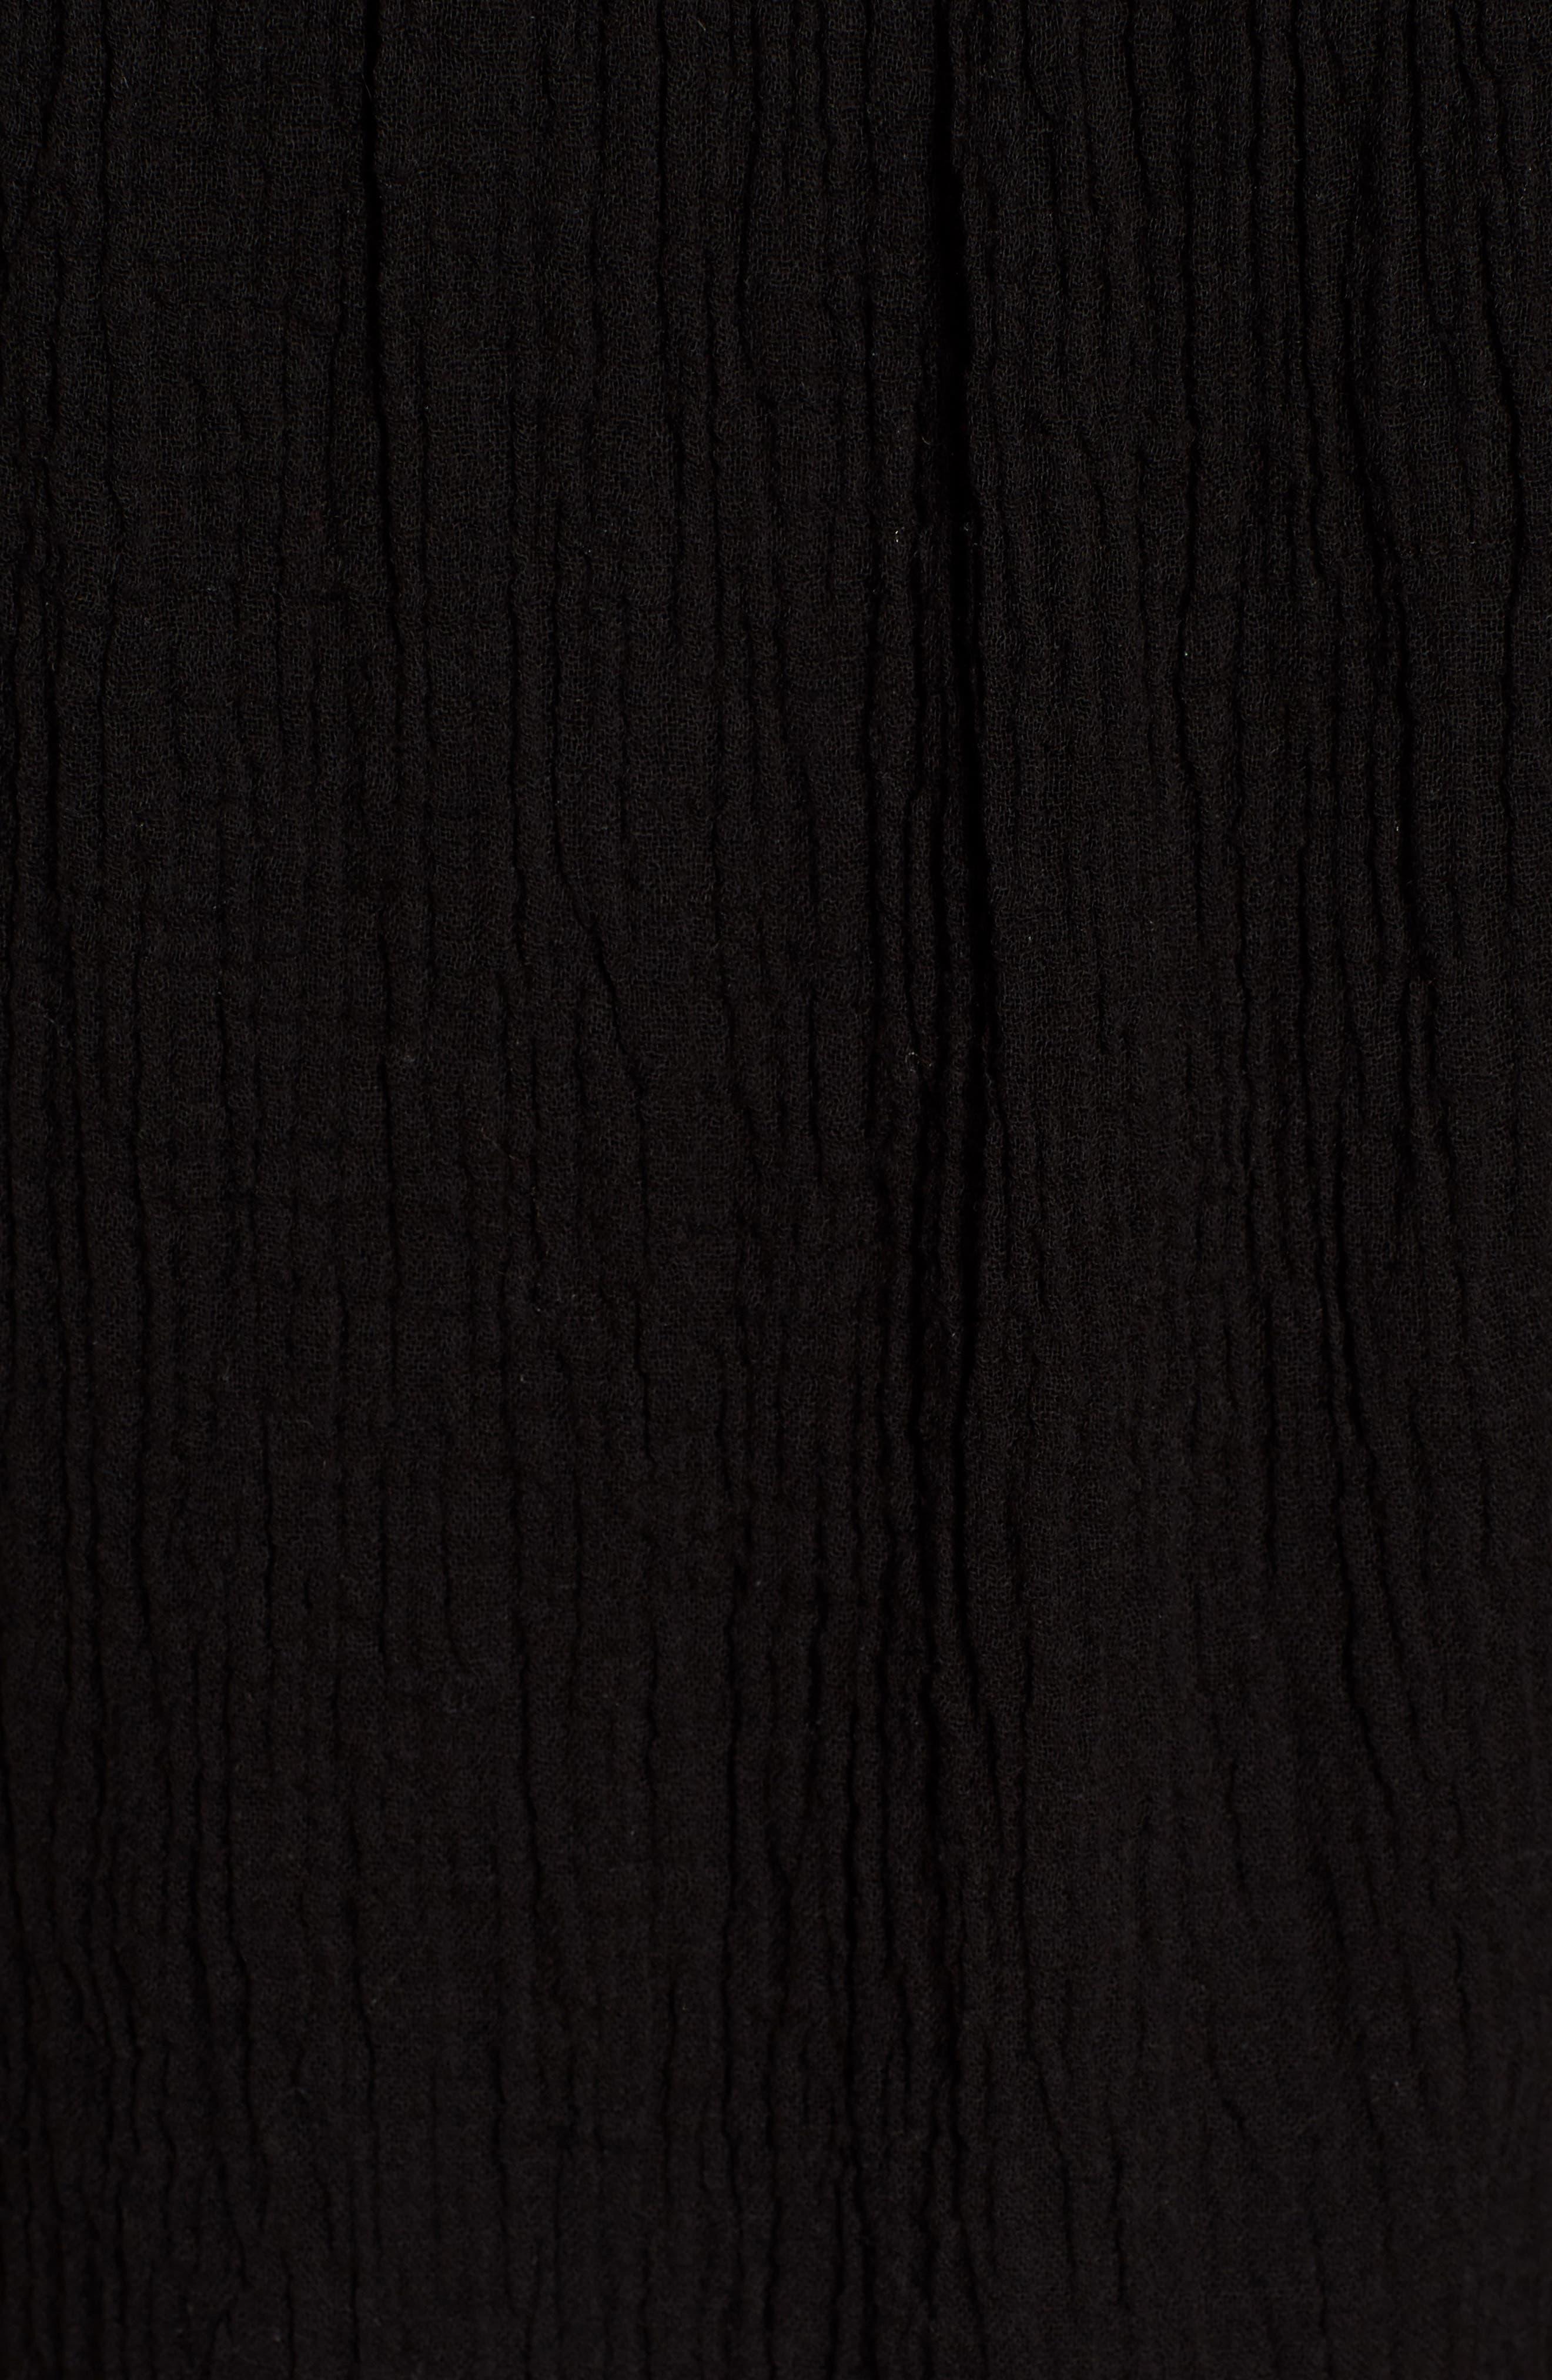 Cutout Sleeve Top,                             Alternate thumbnail 6, color,                             Black